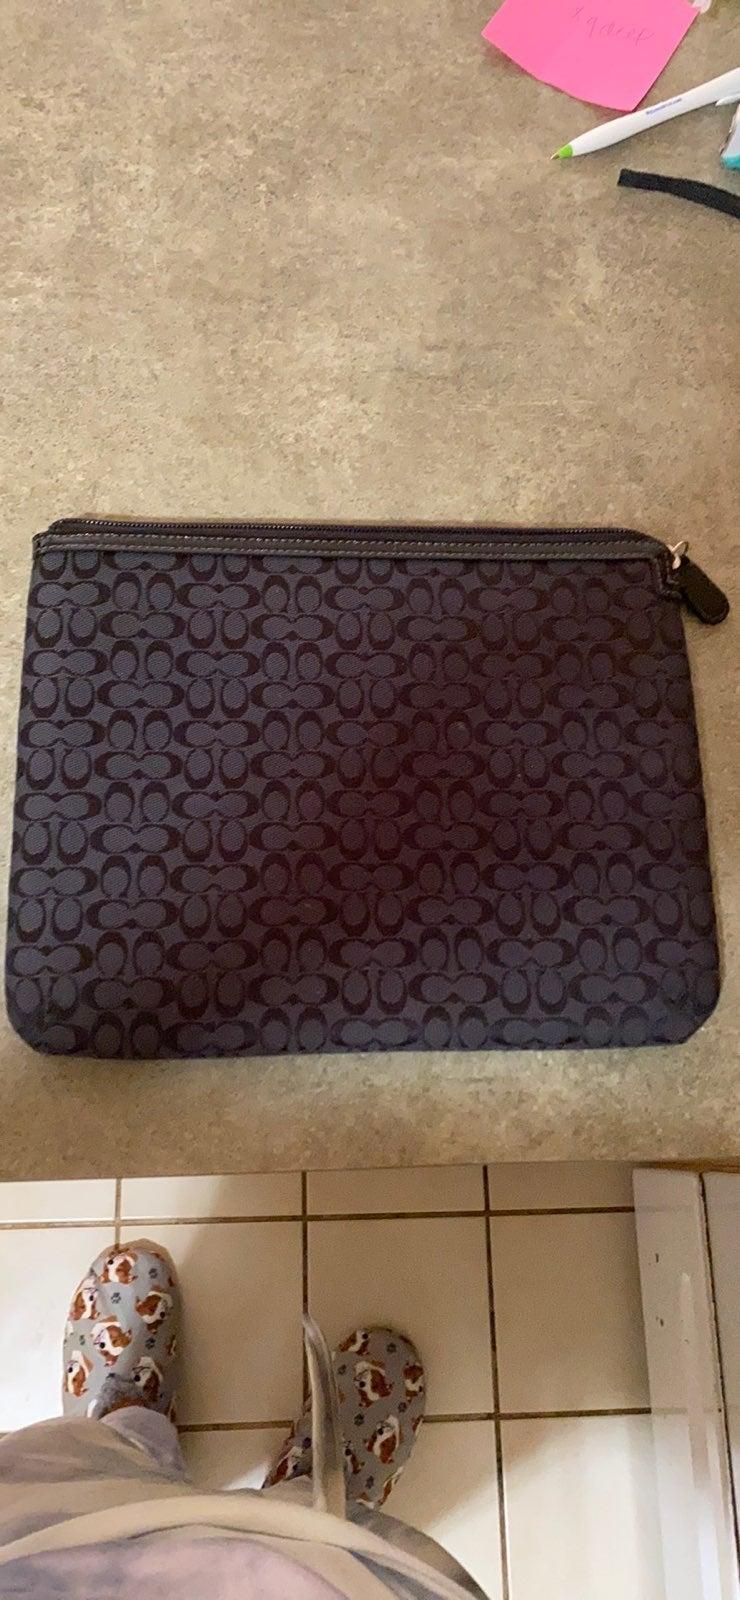 Coach logo ipad/tablet case